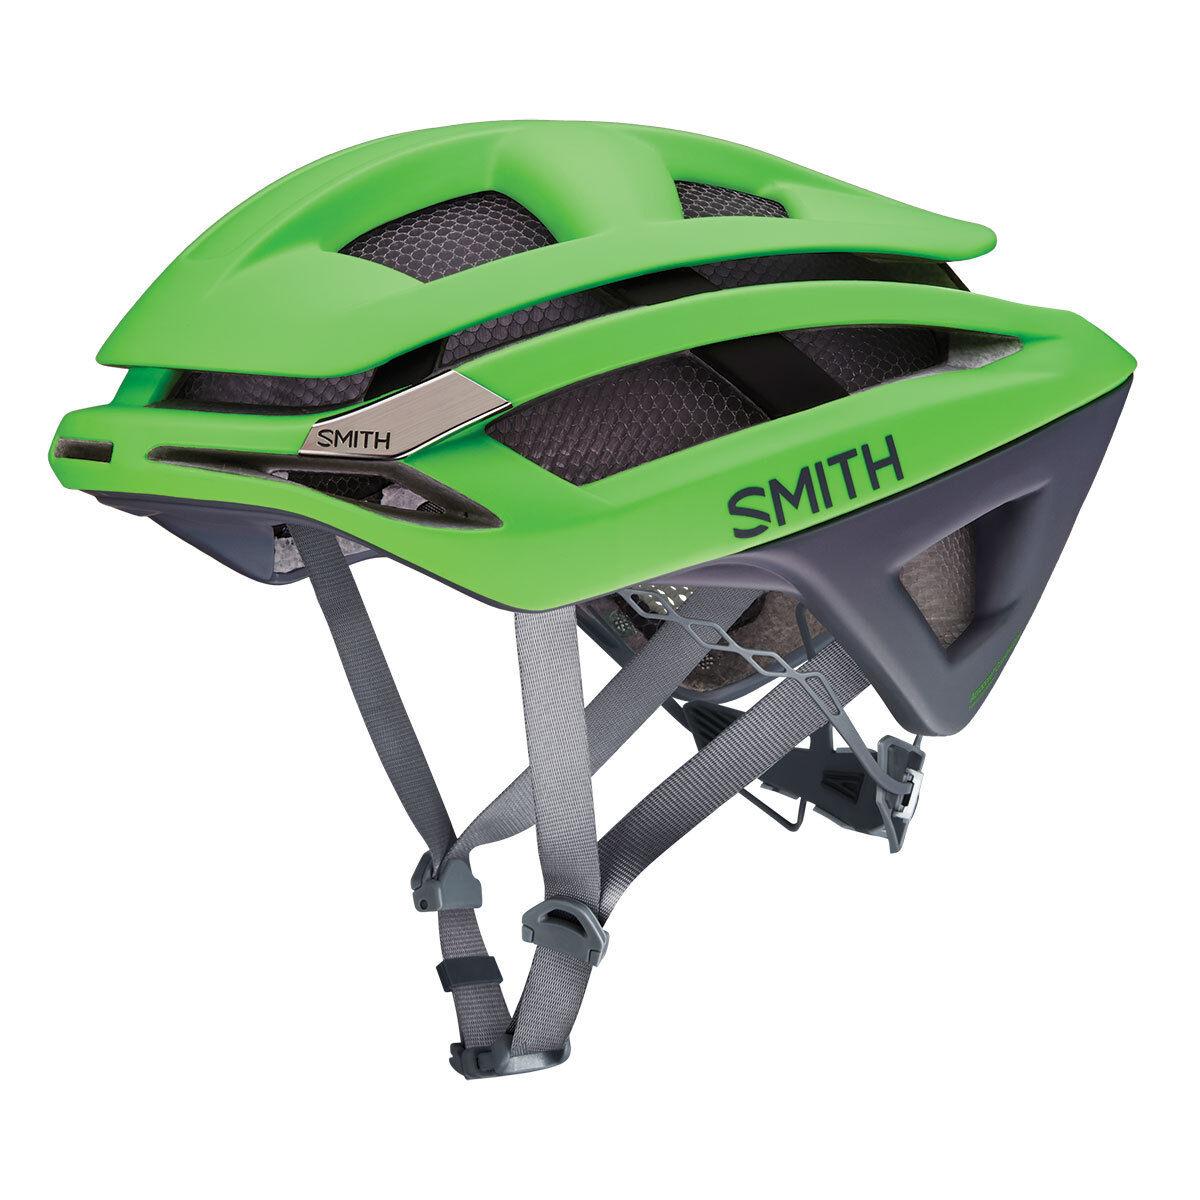 Smith Overdeake cicislmo da strada Caschetto ciclista verde grigio gardient KoroYD